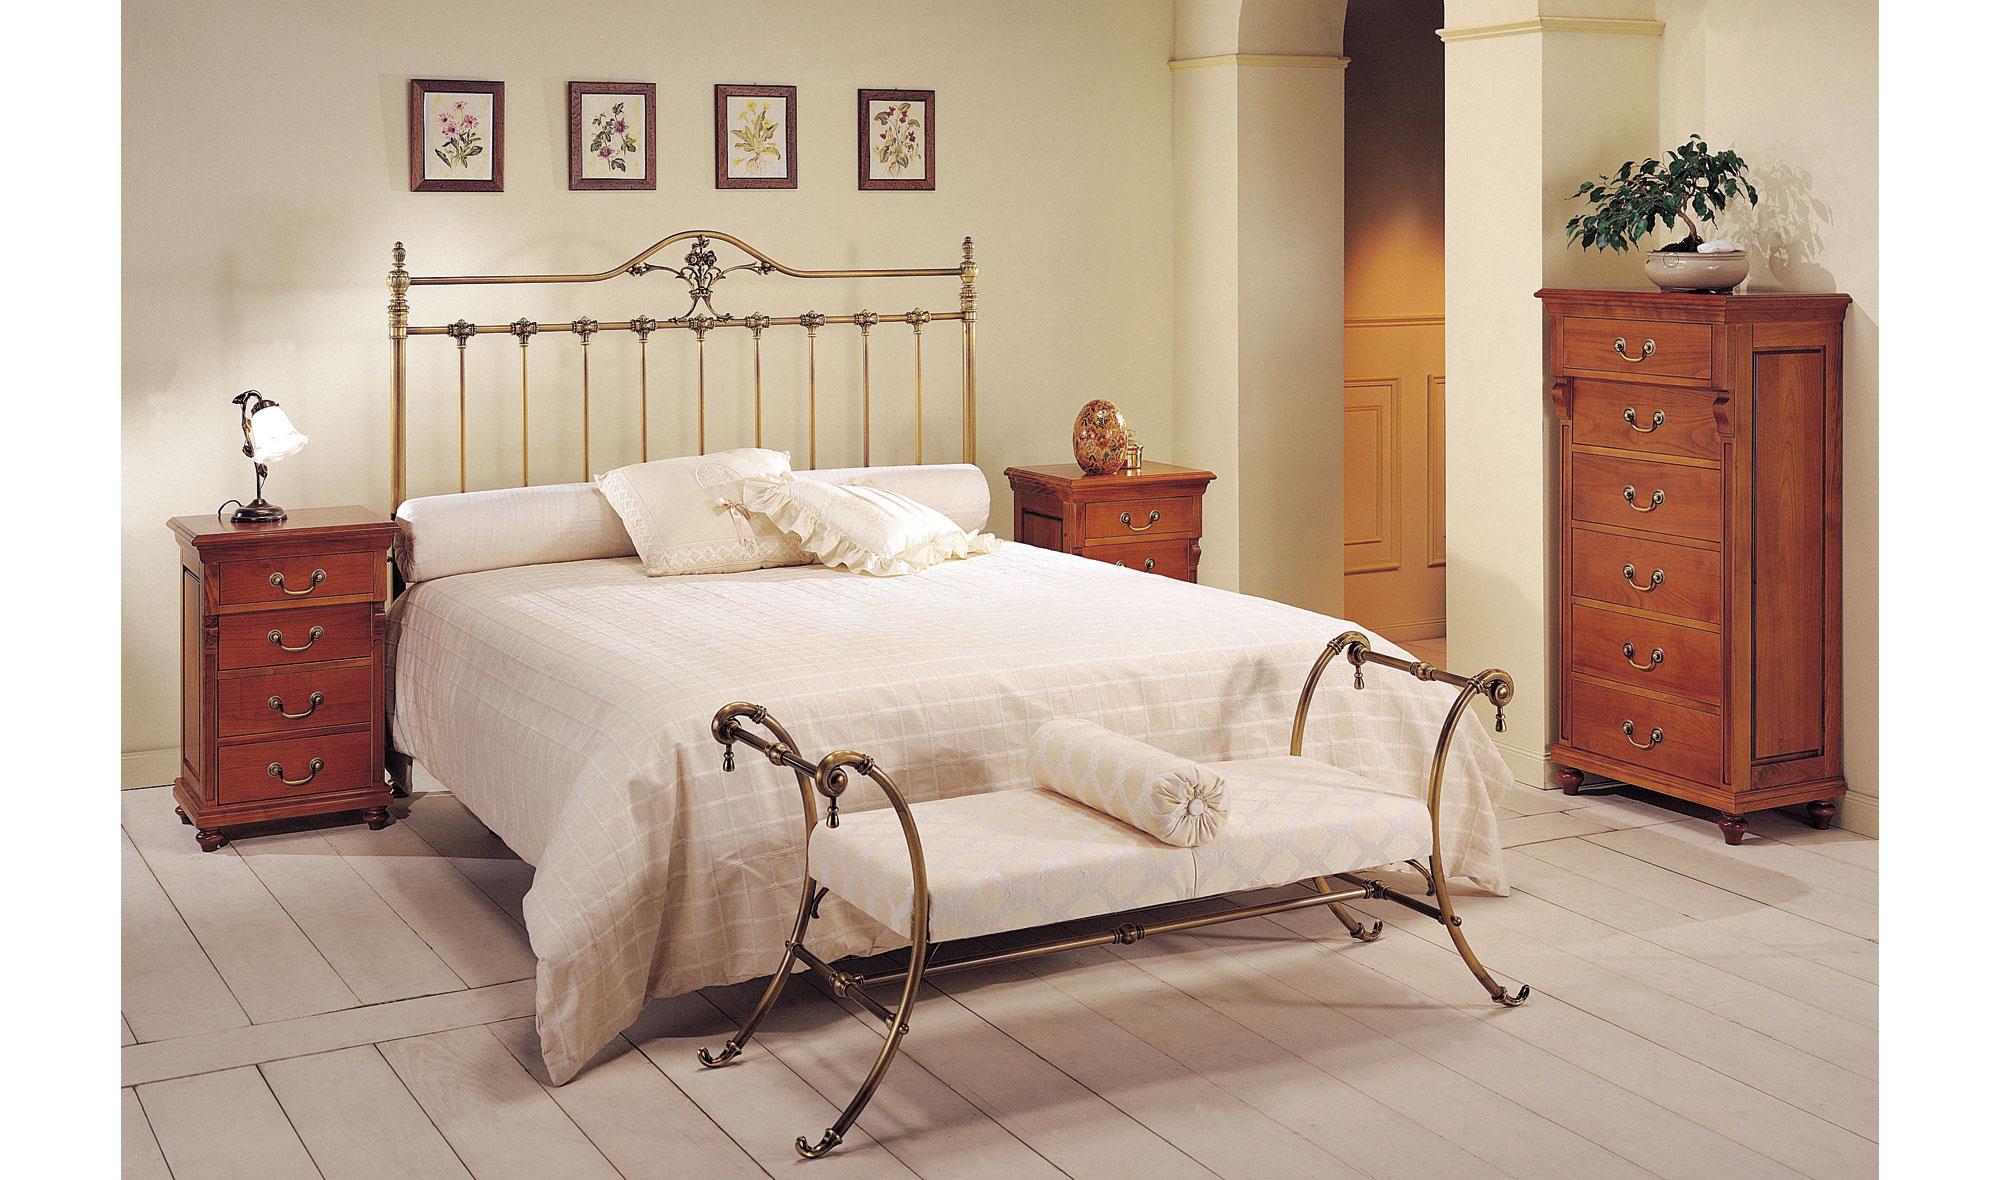 Dormitorio forja viridiana en for Muebles forja